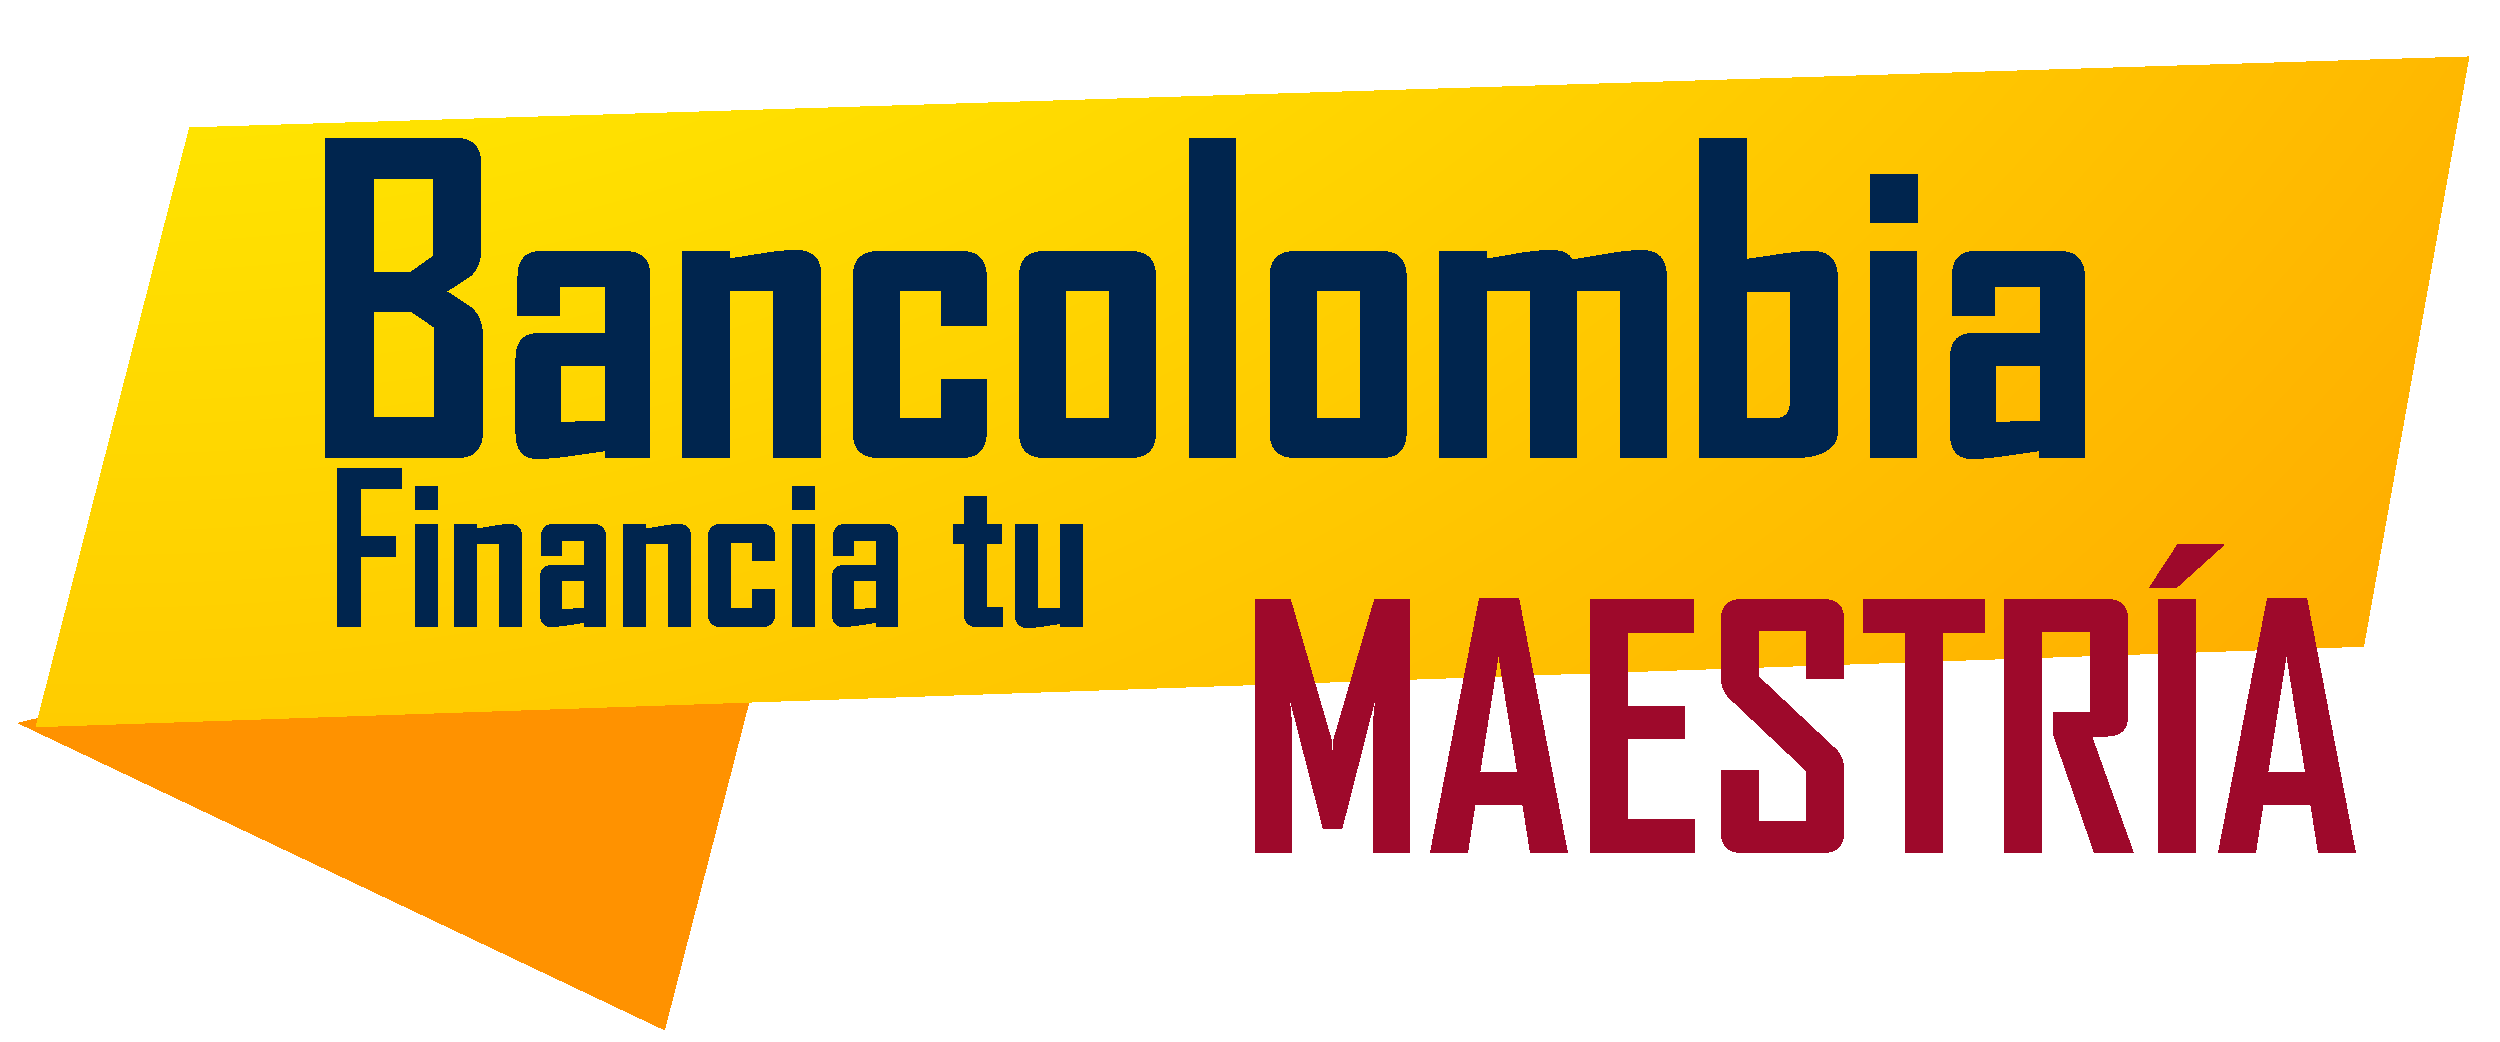 Convenio Bancolombia